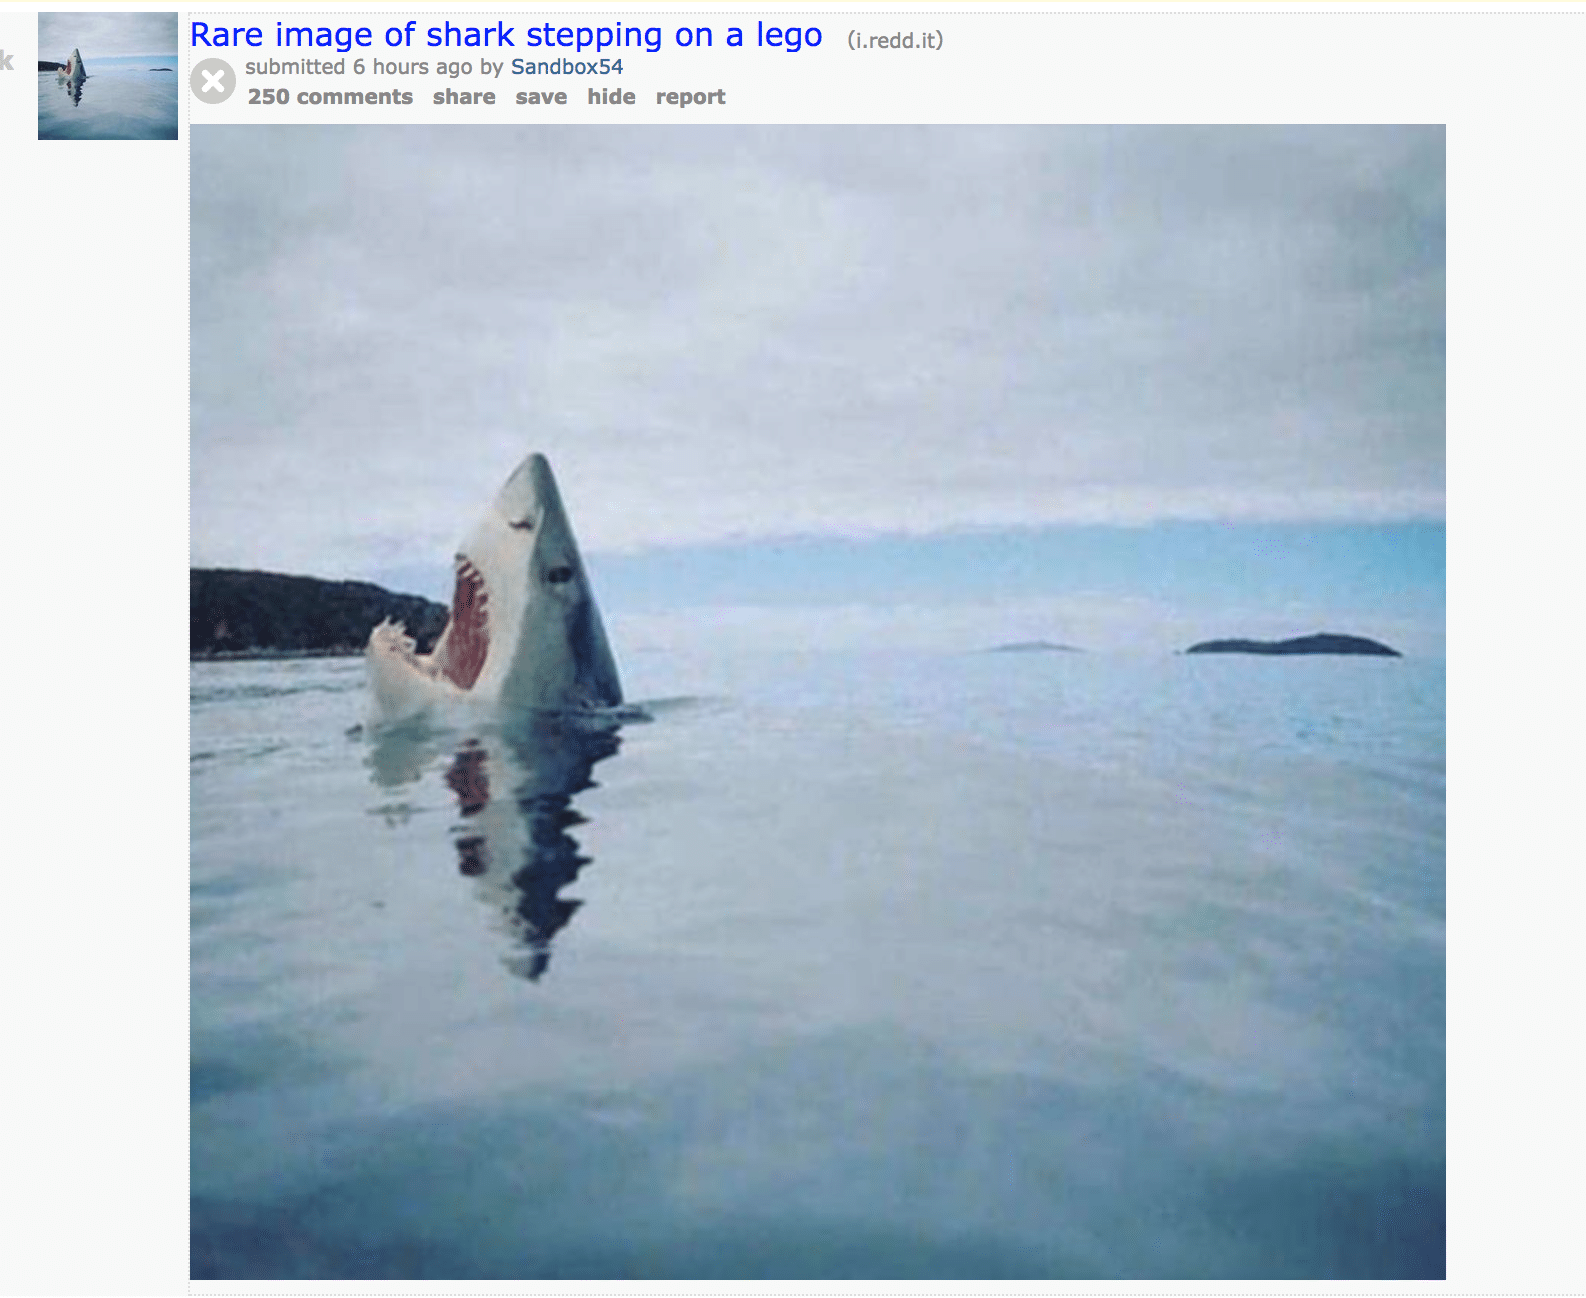 Redditors rare image of shark